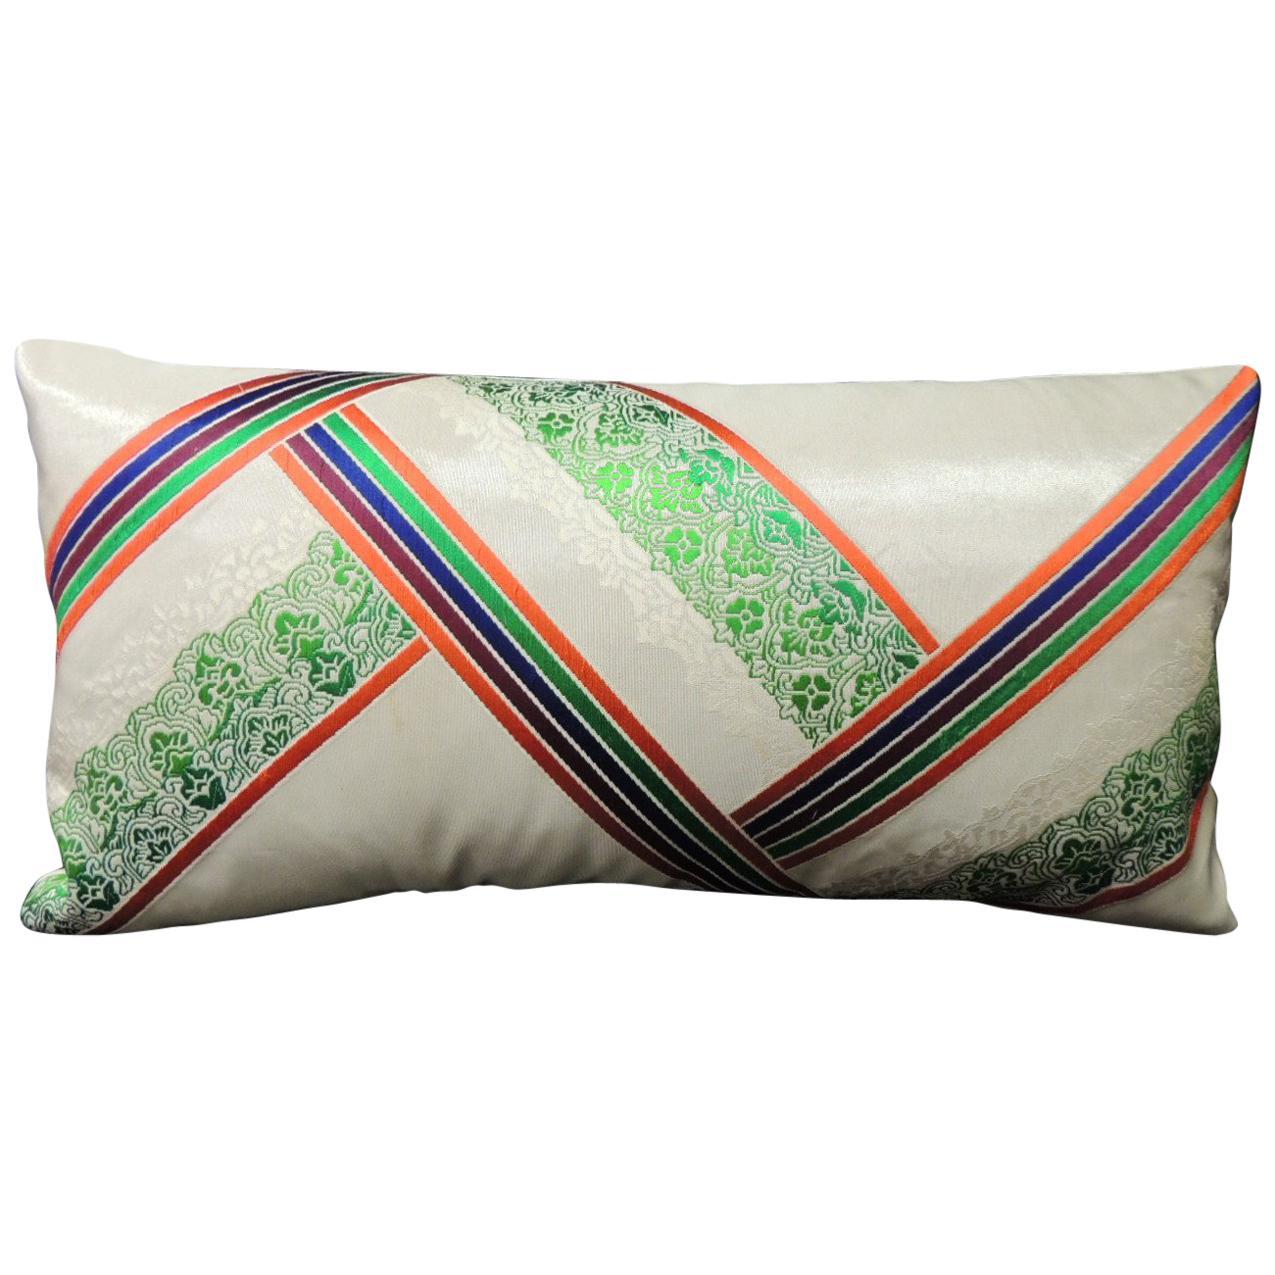 Vintage Orange and Green Obi Decorative Silk Embroidery Lumbar Pillow